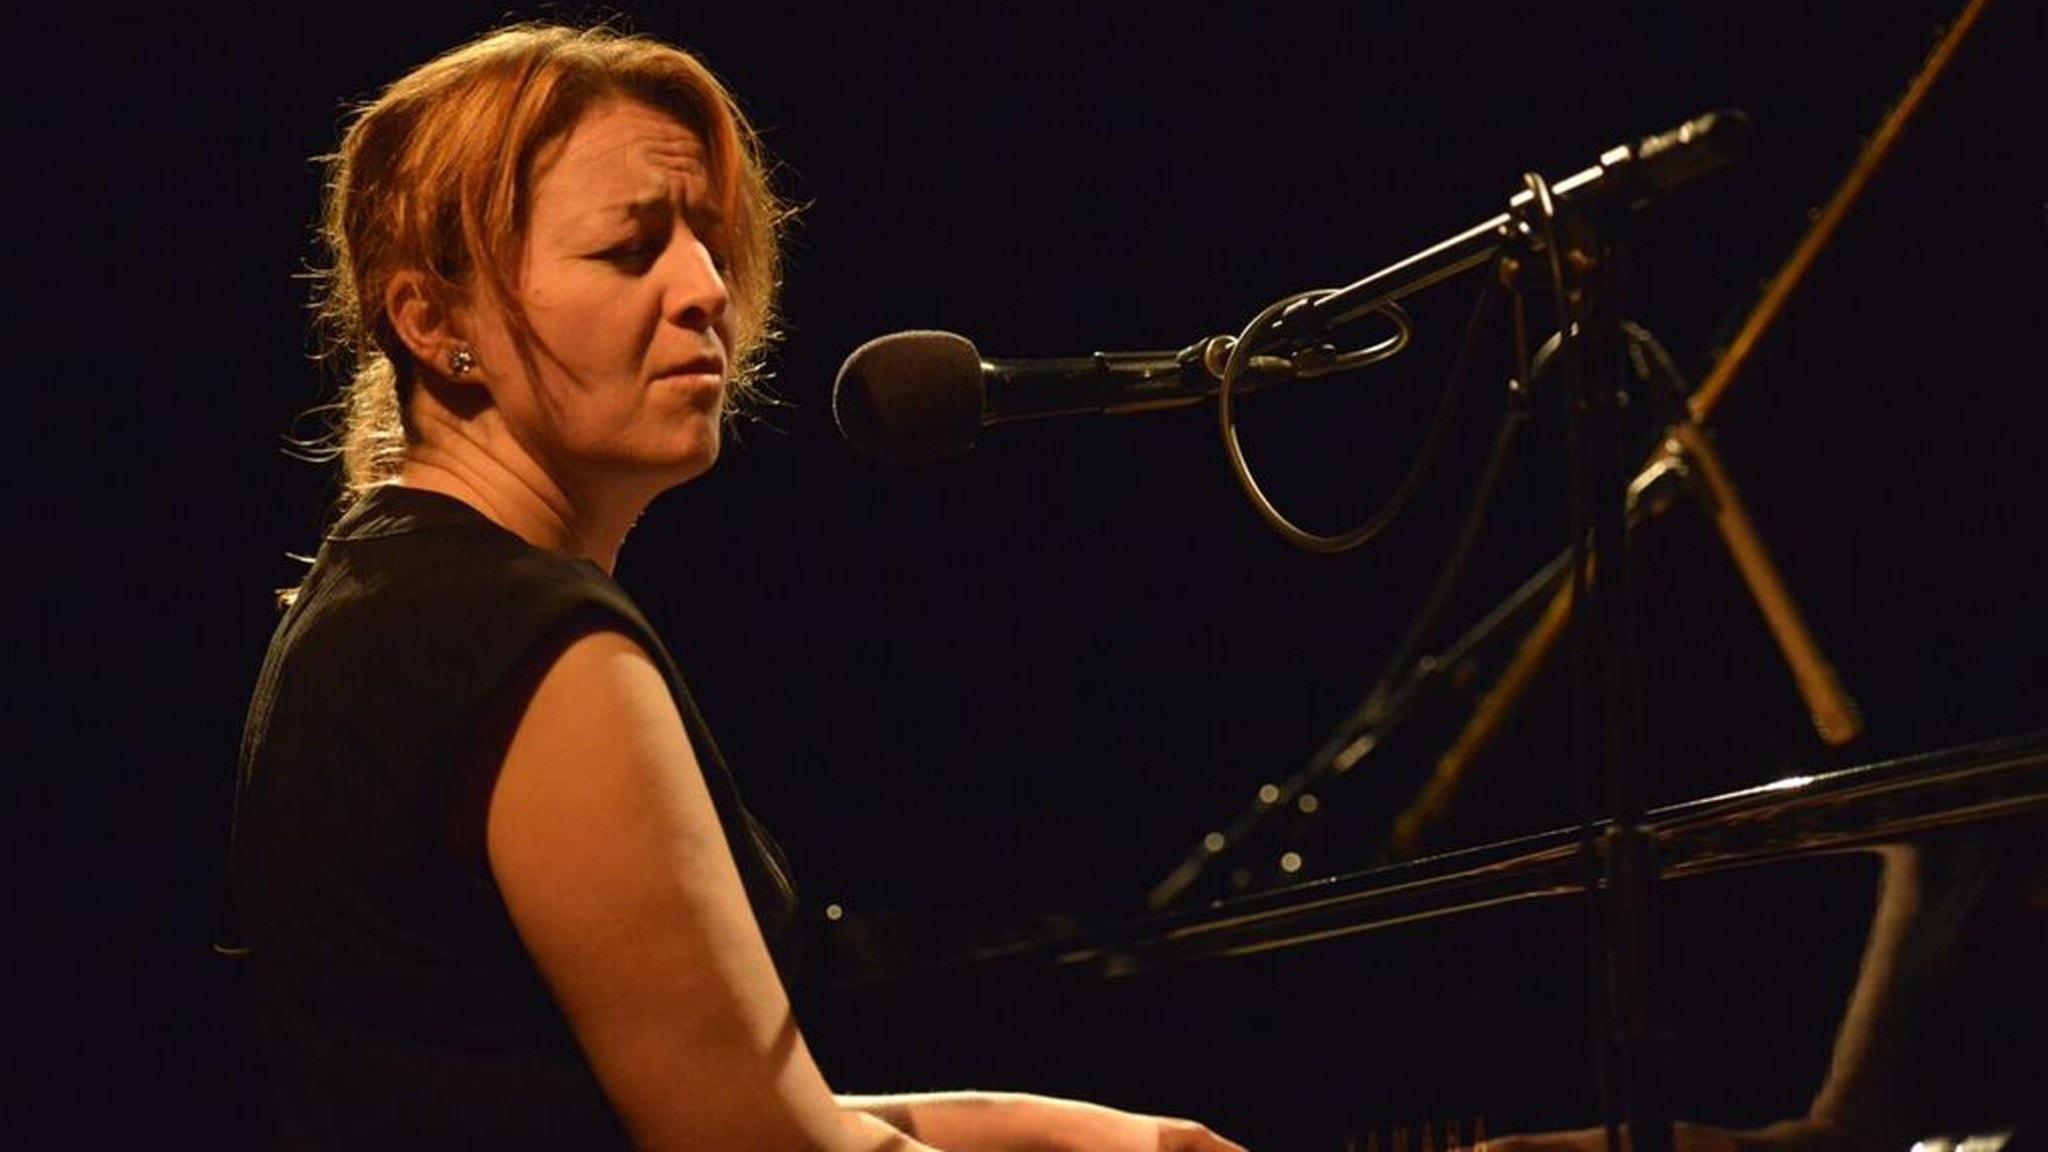 Vällagrat och nysläppt plus Teresa Indebetou Band live